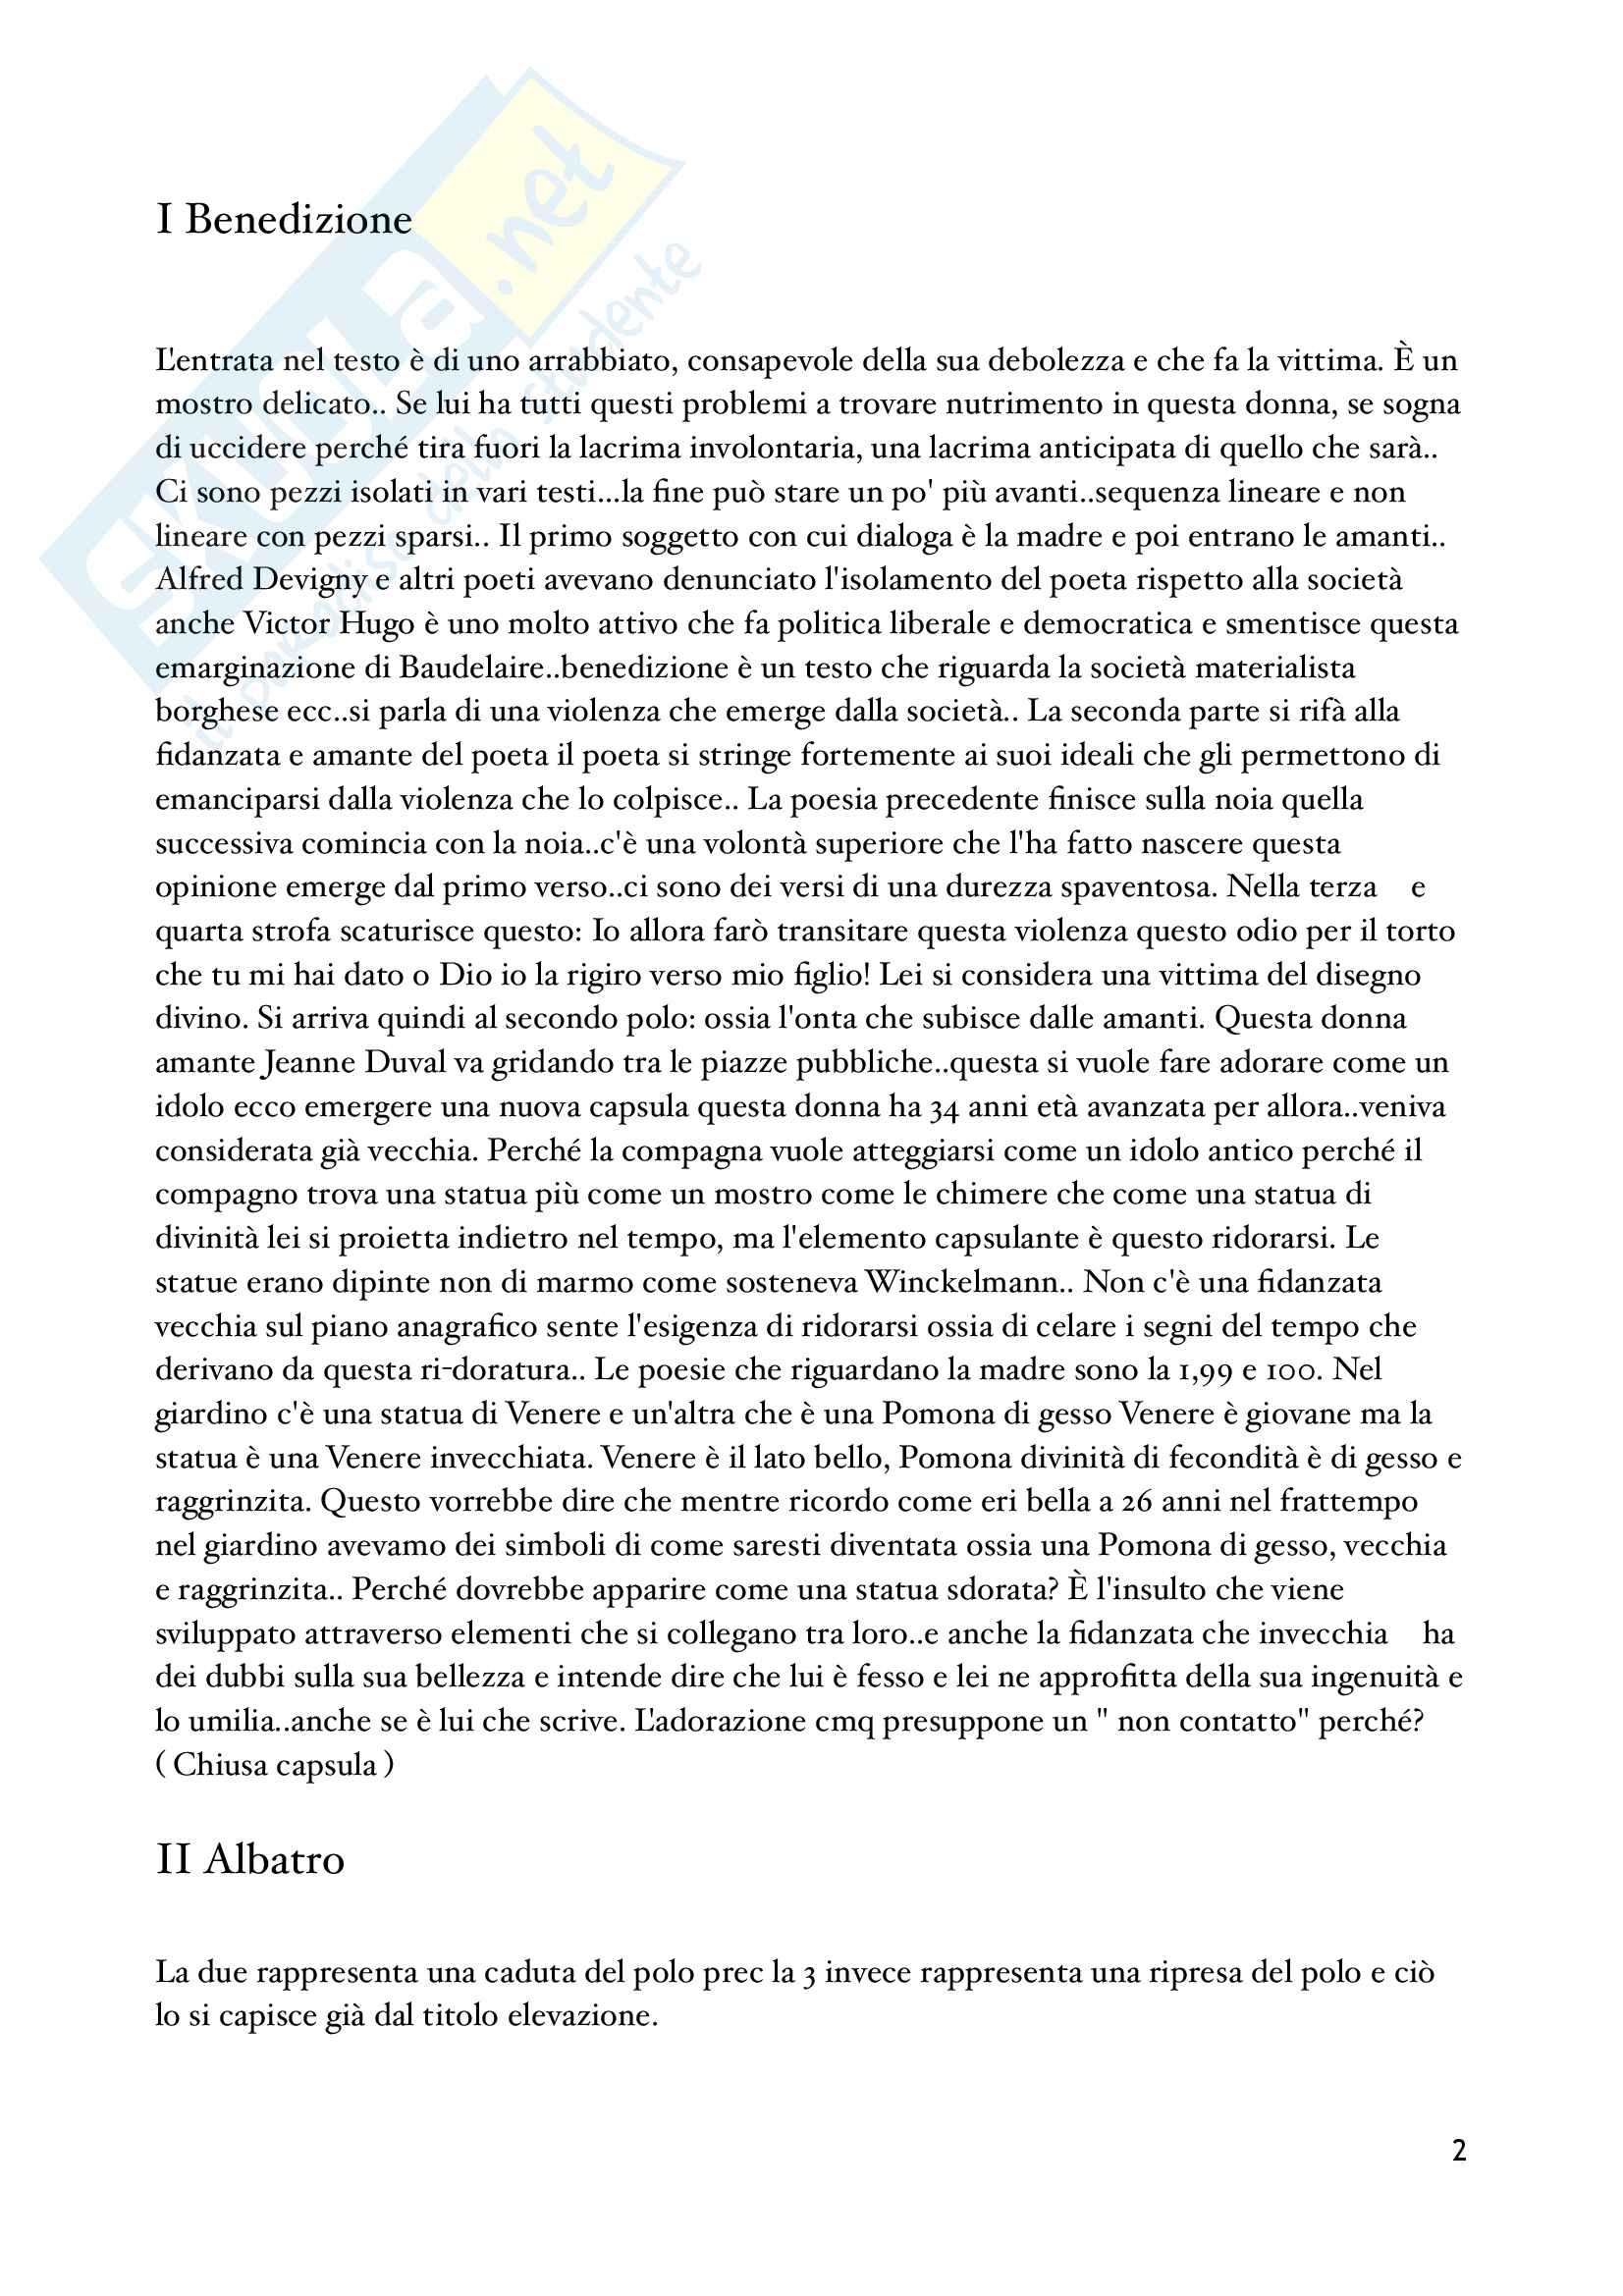 Letteratura francese Baudelaire Pag. 2